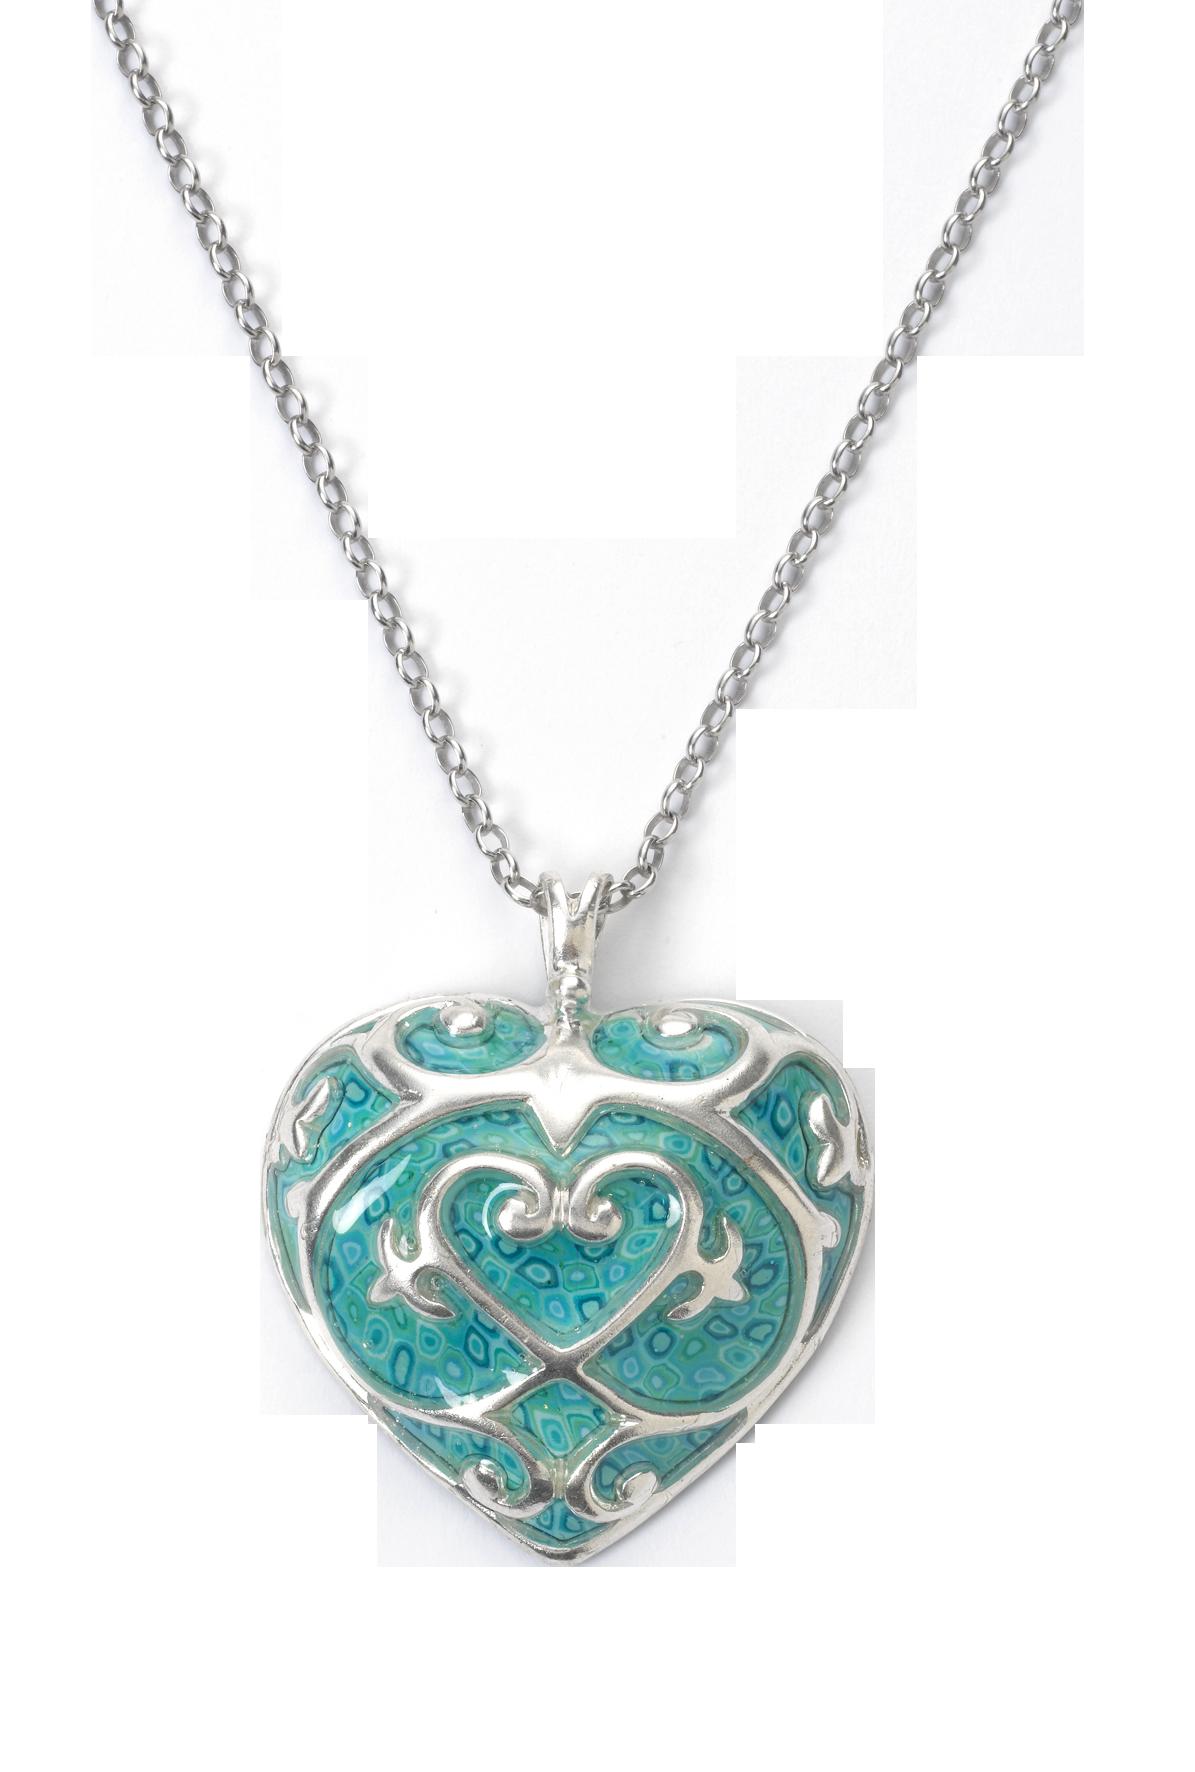 Creative Turquoise Heart Pendant Pendant Lighting Exquisite Creative Turquoise Heart Pendant